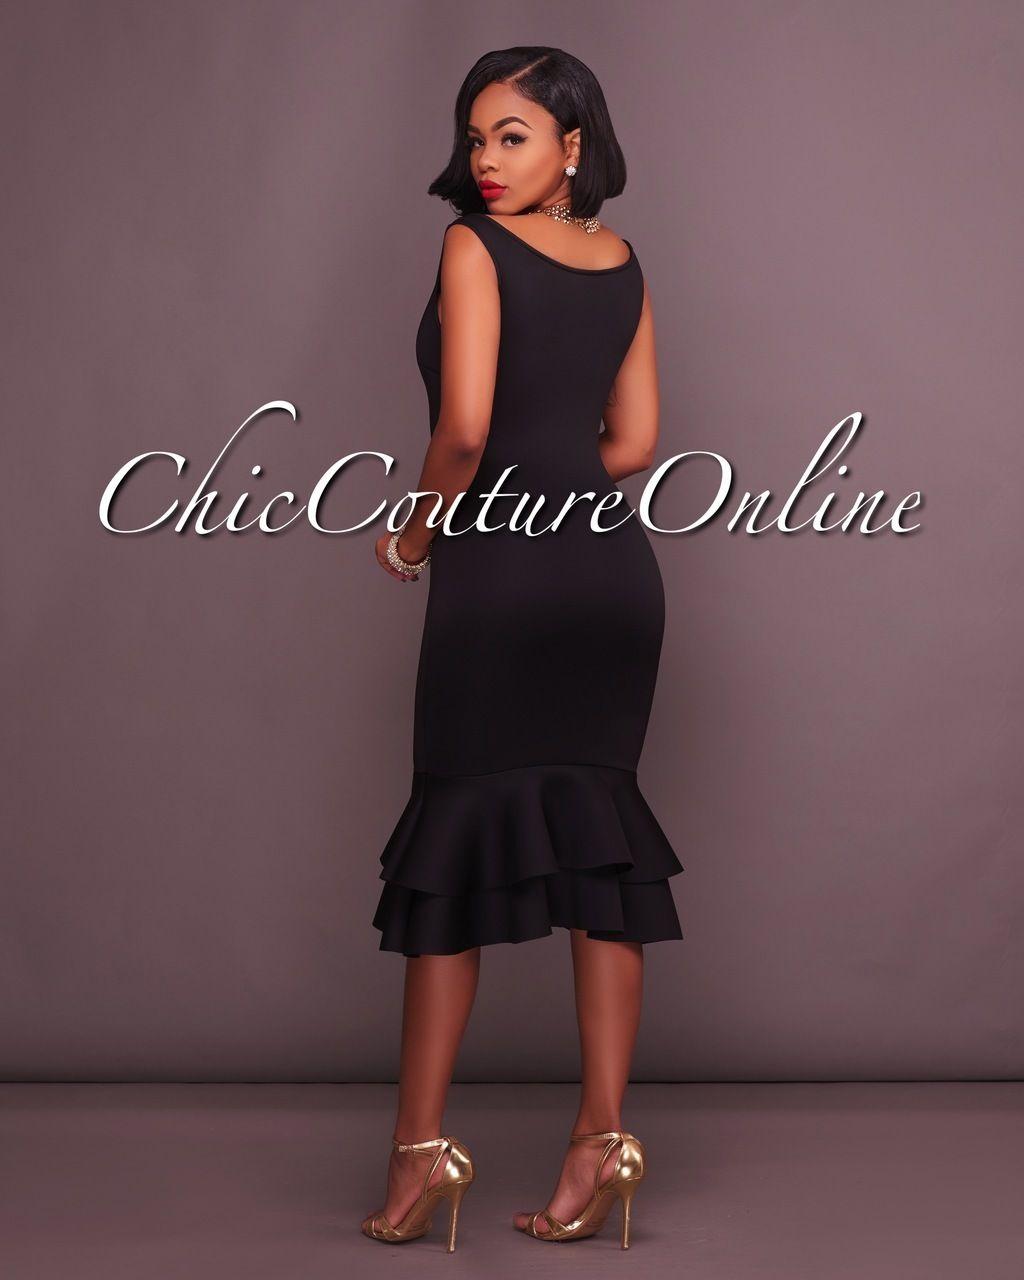 Chic Couture Online - Layla Black Mermaid Shape Ruffle Midi Dress,  (http://www.chiccoutureonline.com/layla-black-mermaid-shape-ruffle-midi-dress/)